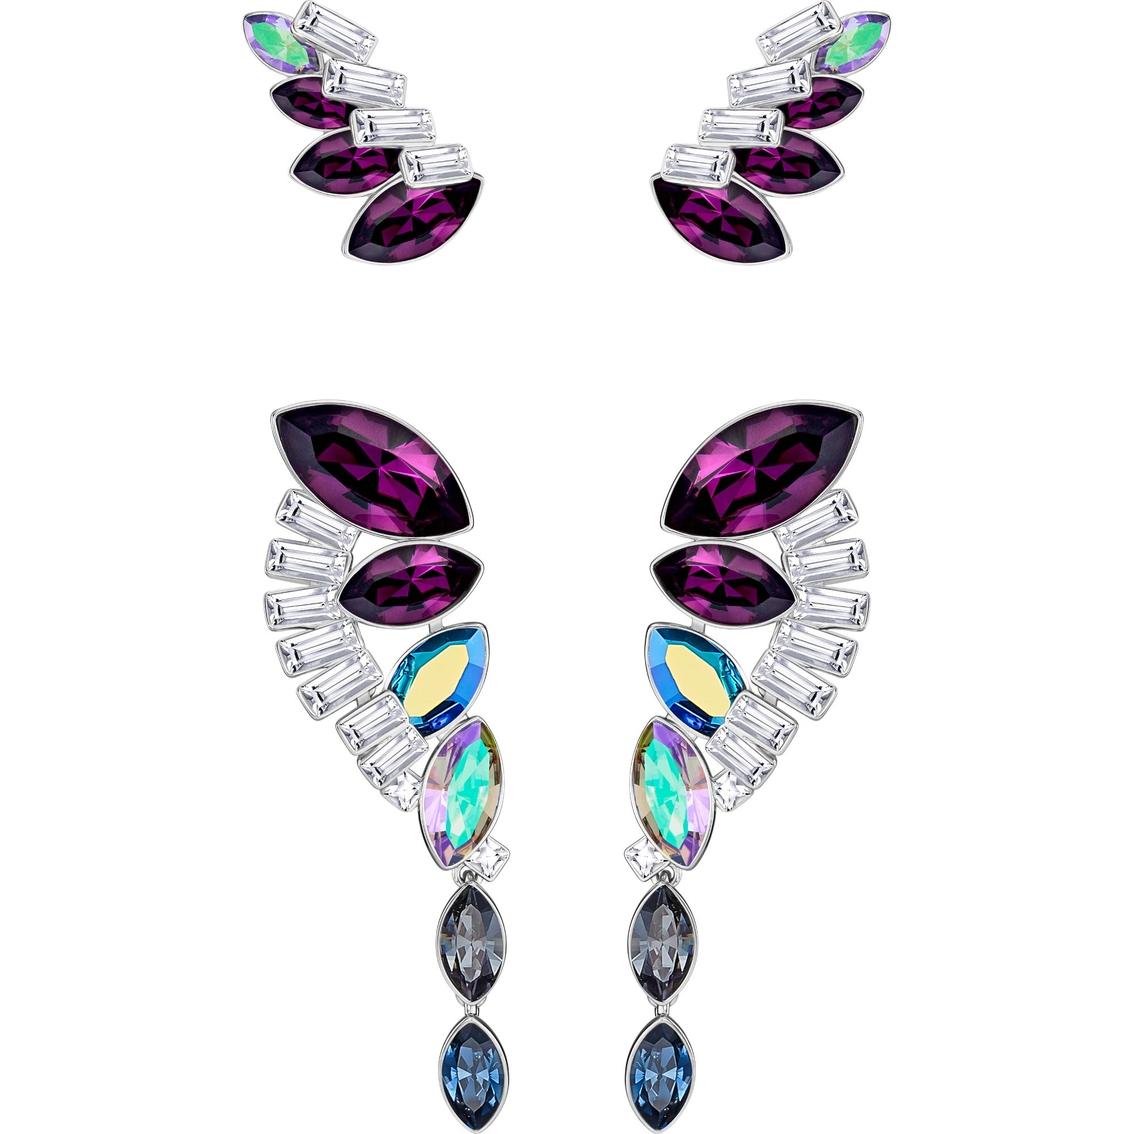 46252bd1d Swarovski Cosmic Pierced Earring Set   Crystal Jewelry   Jewelry ...